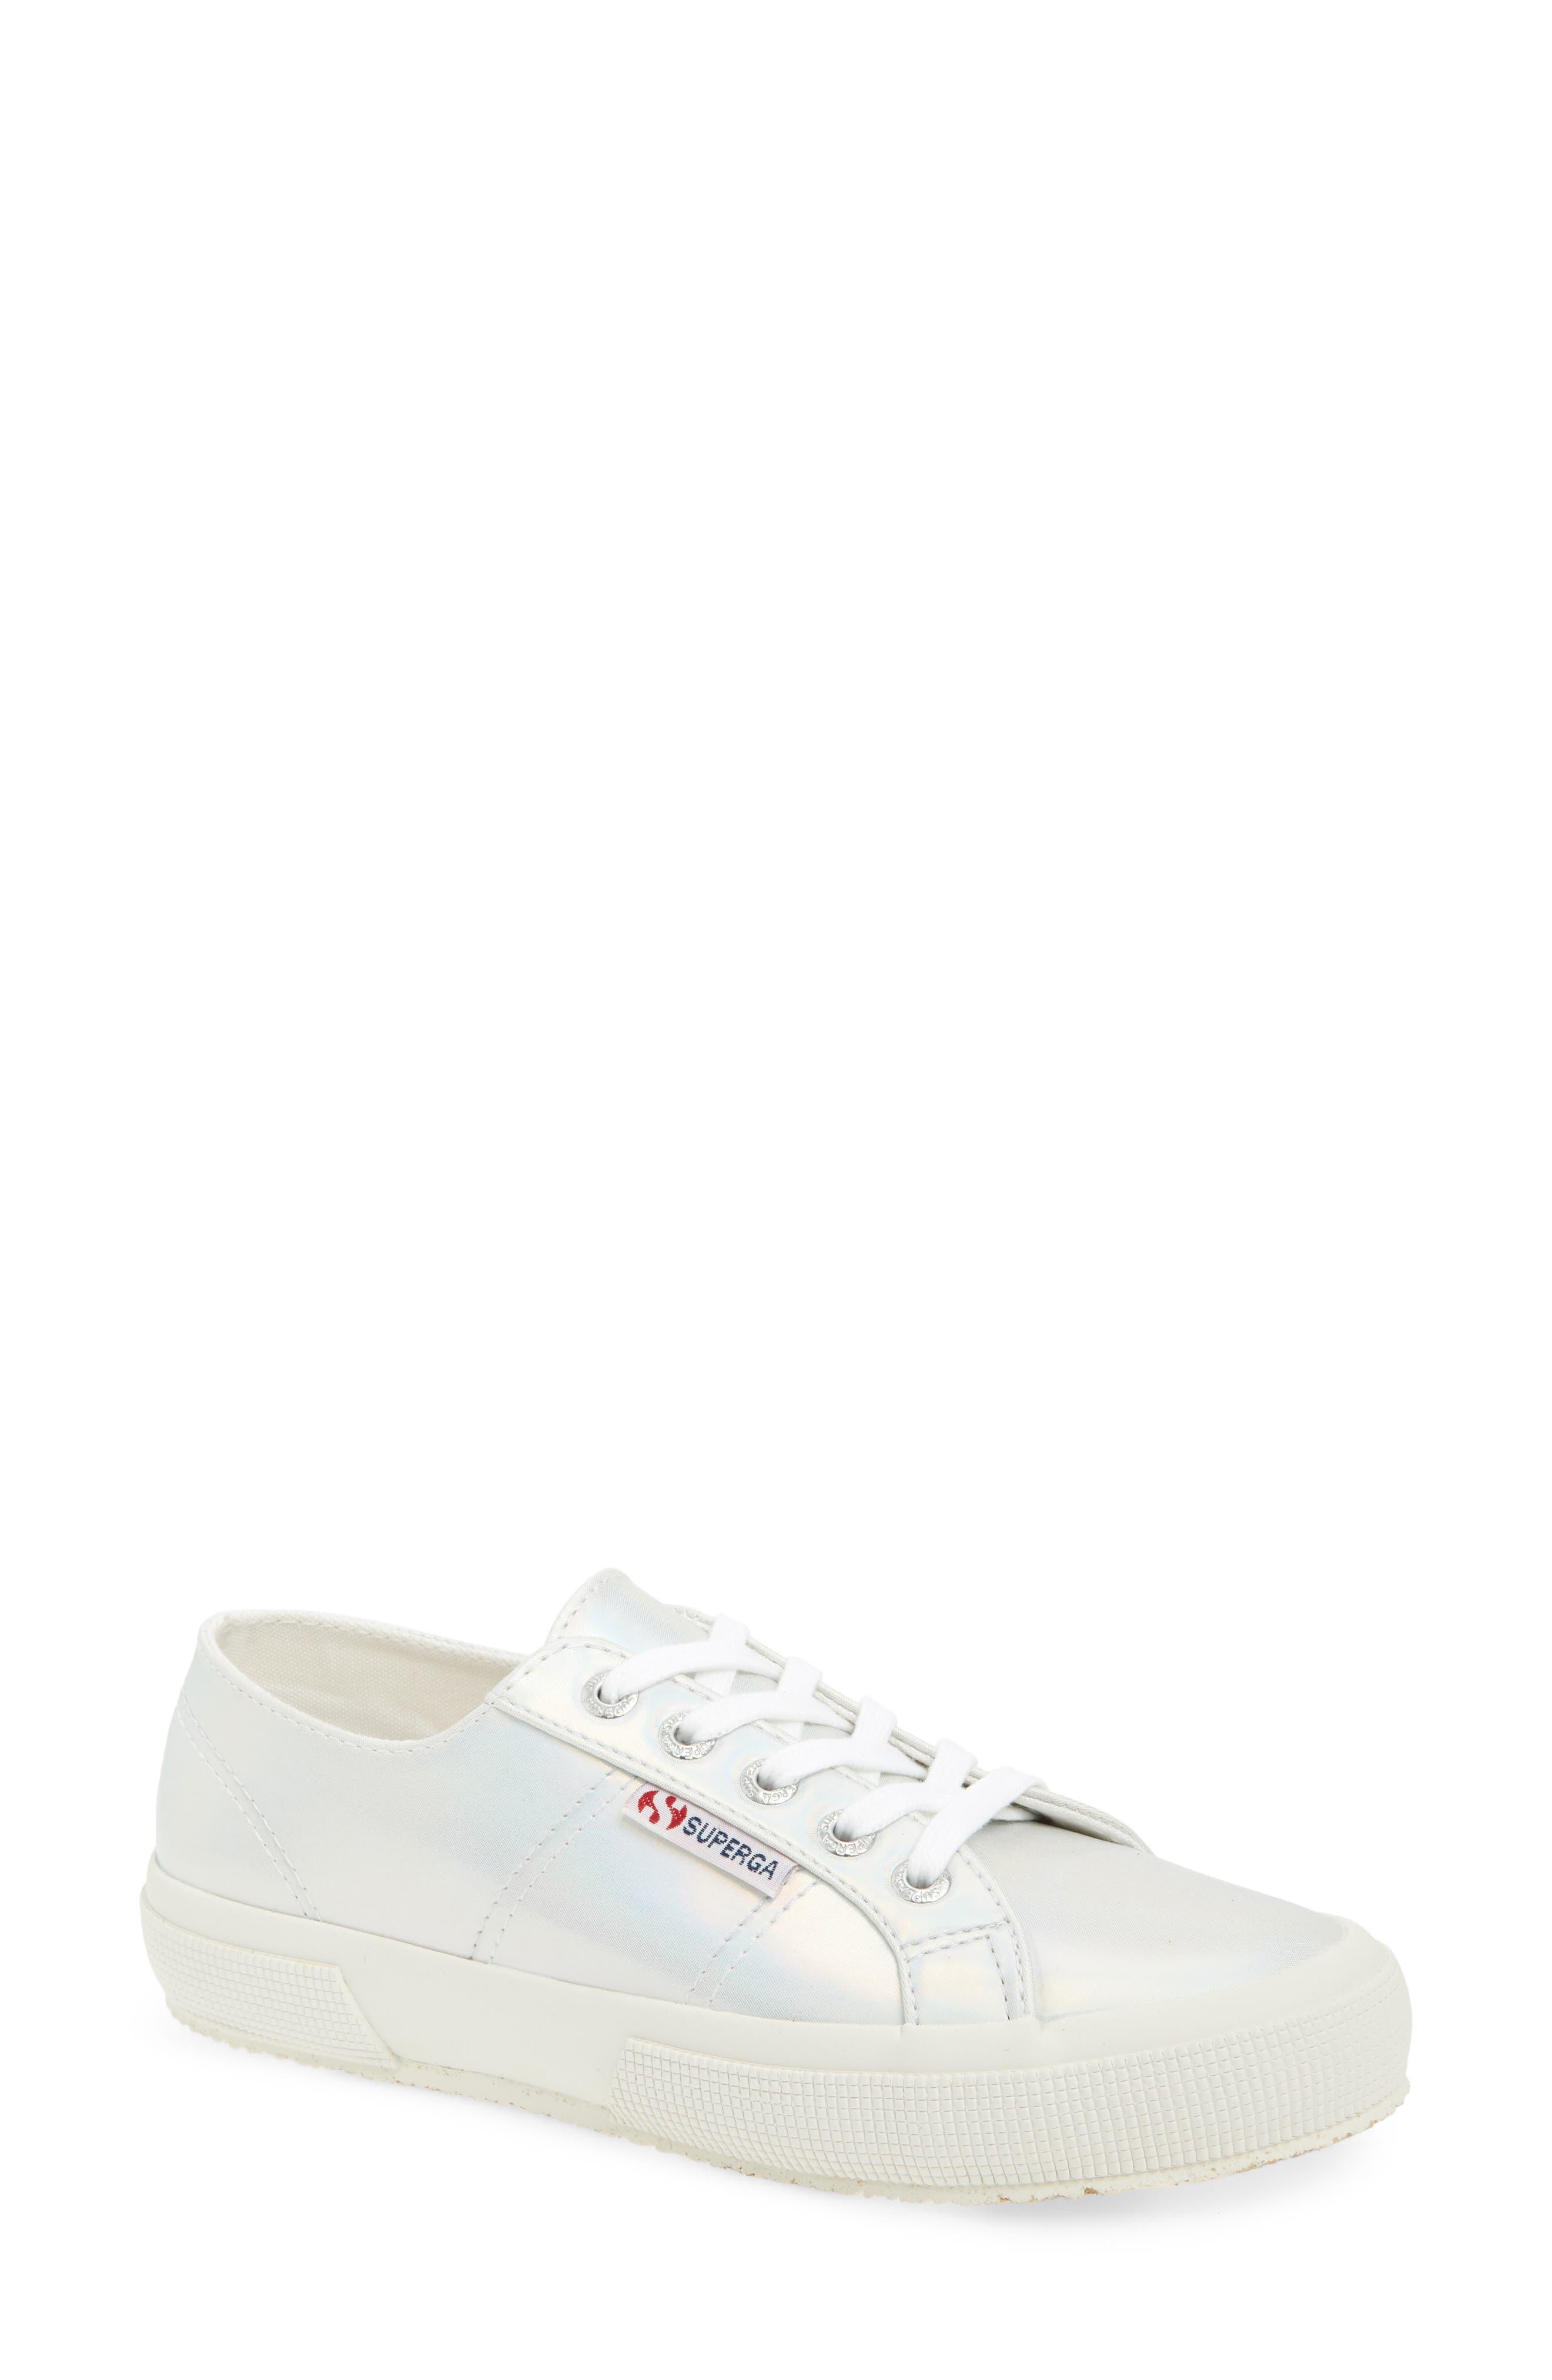 Superga 2750 Hologramw Low Top Sneaker (Women)